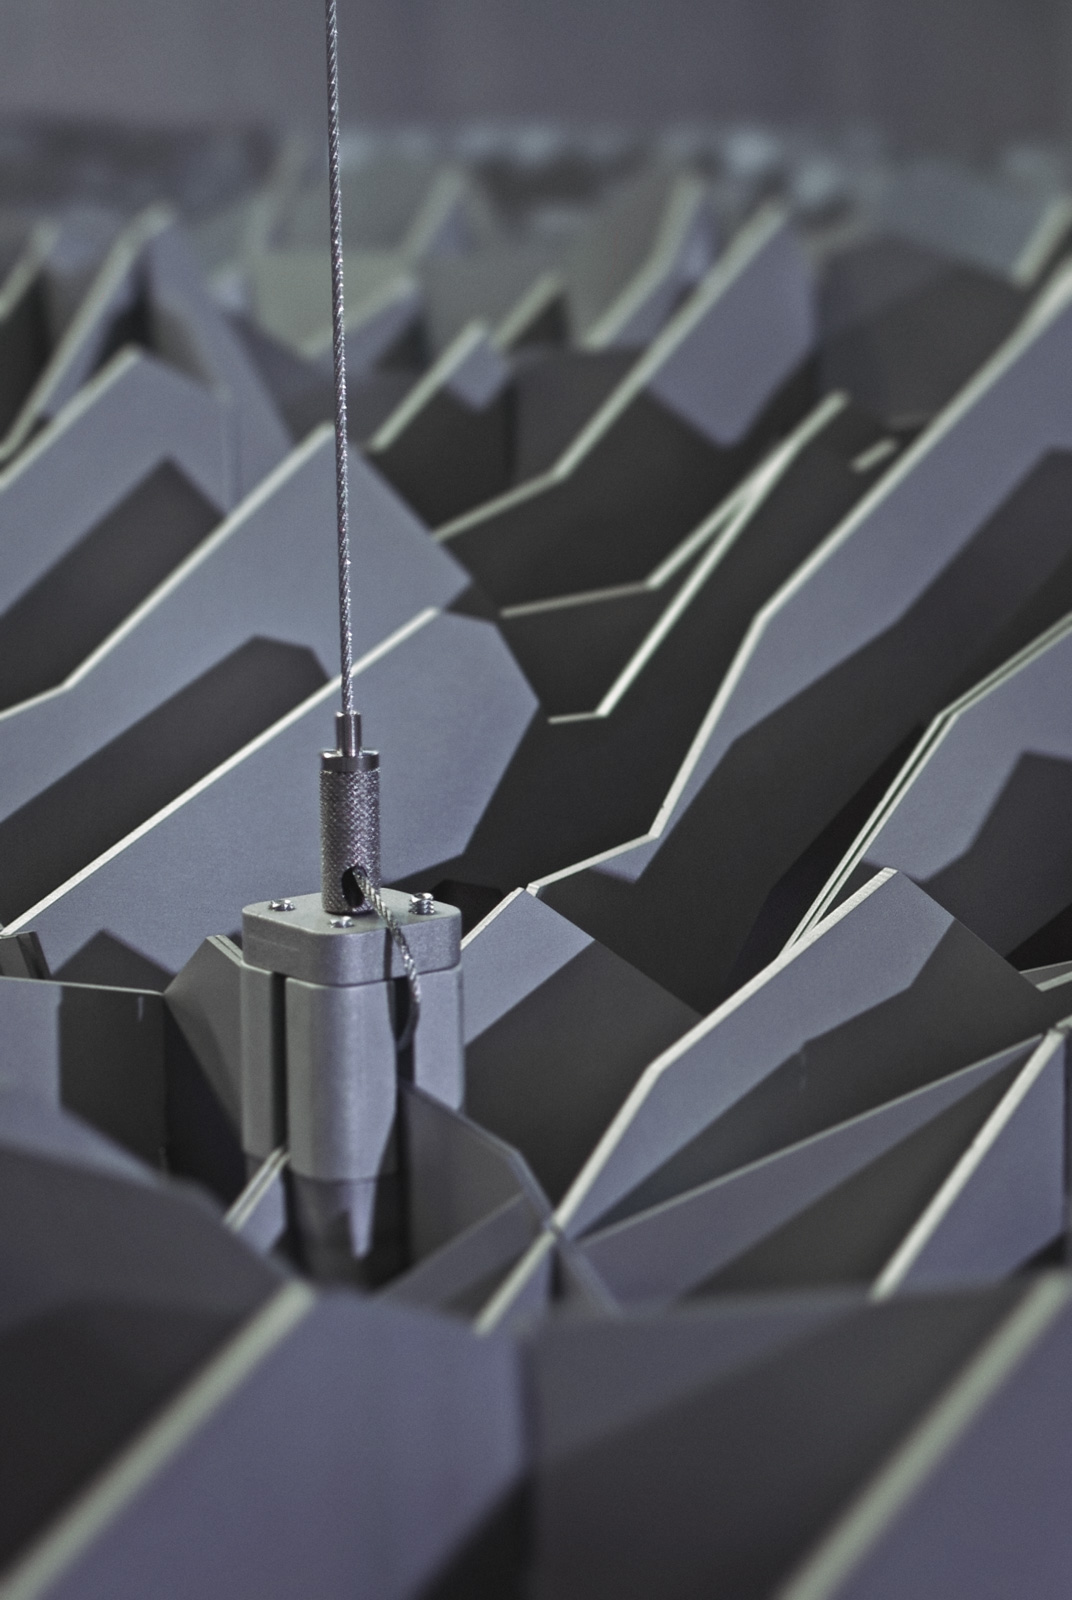 Helvetia Aeria Landesmuseum Zürich Topographie Deckenskulptur